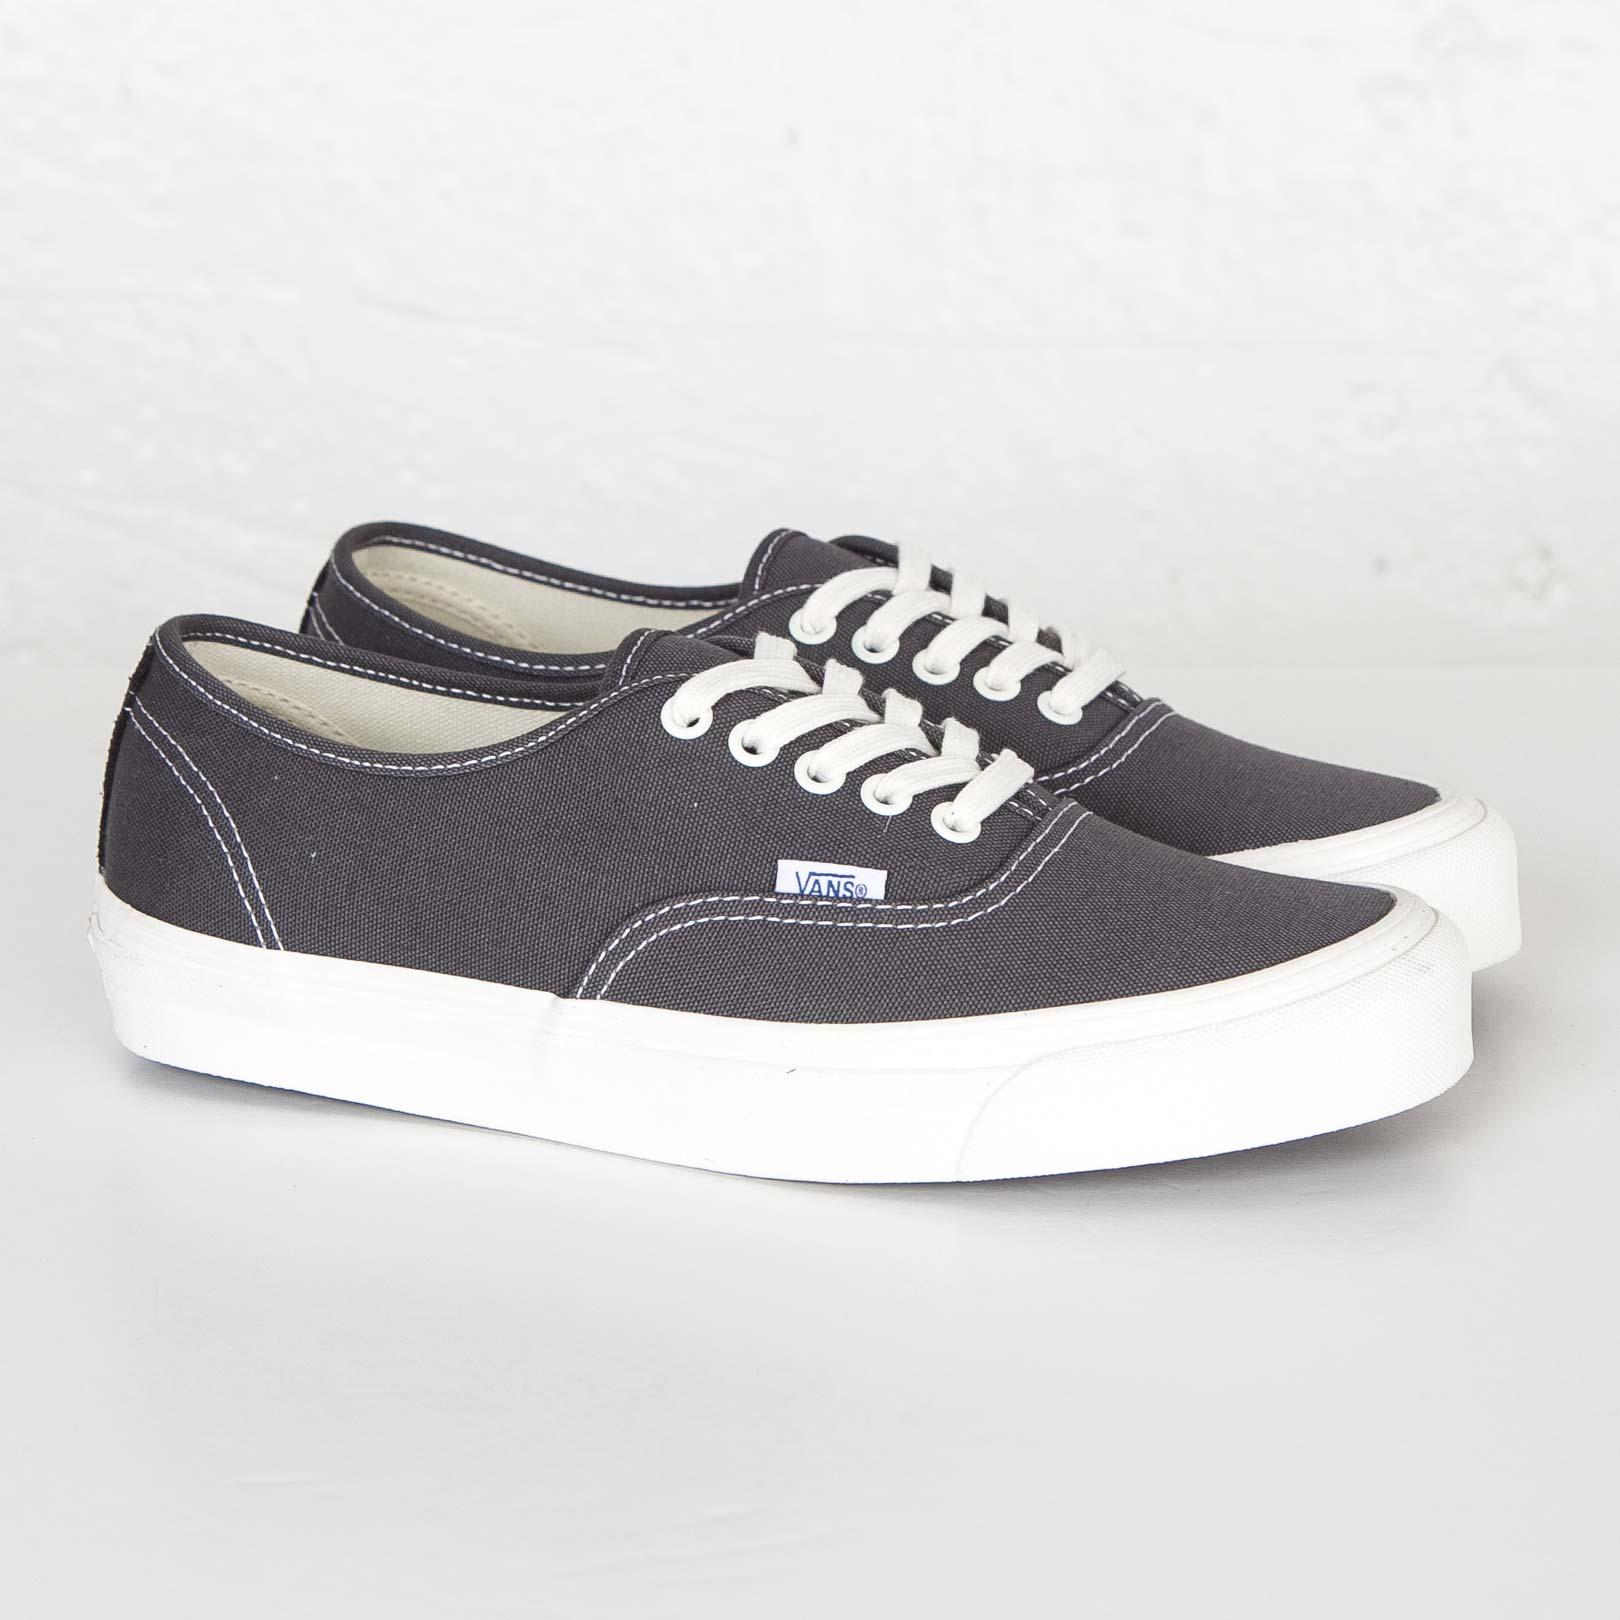 ab49ec60a709 Vans OG Authentic LX - Vuddiat - Sneakersnstuff